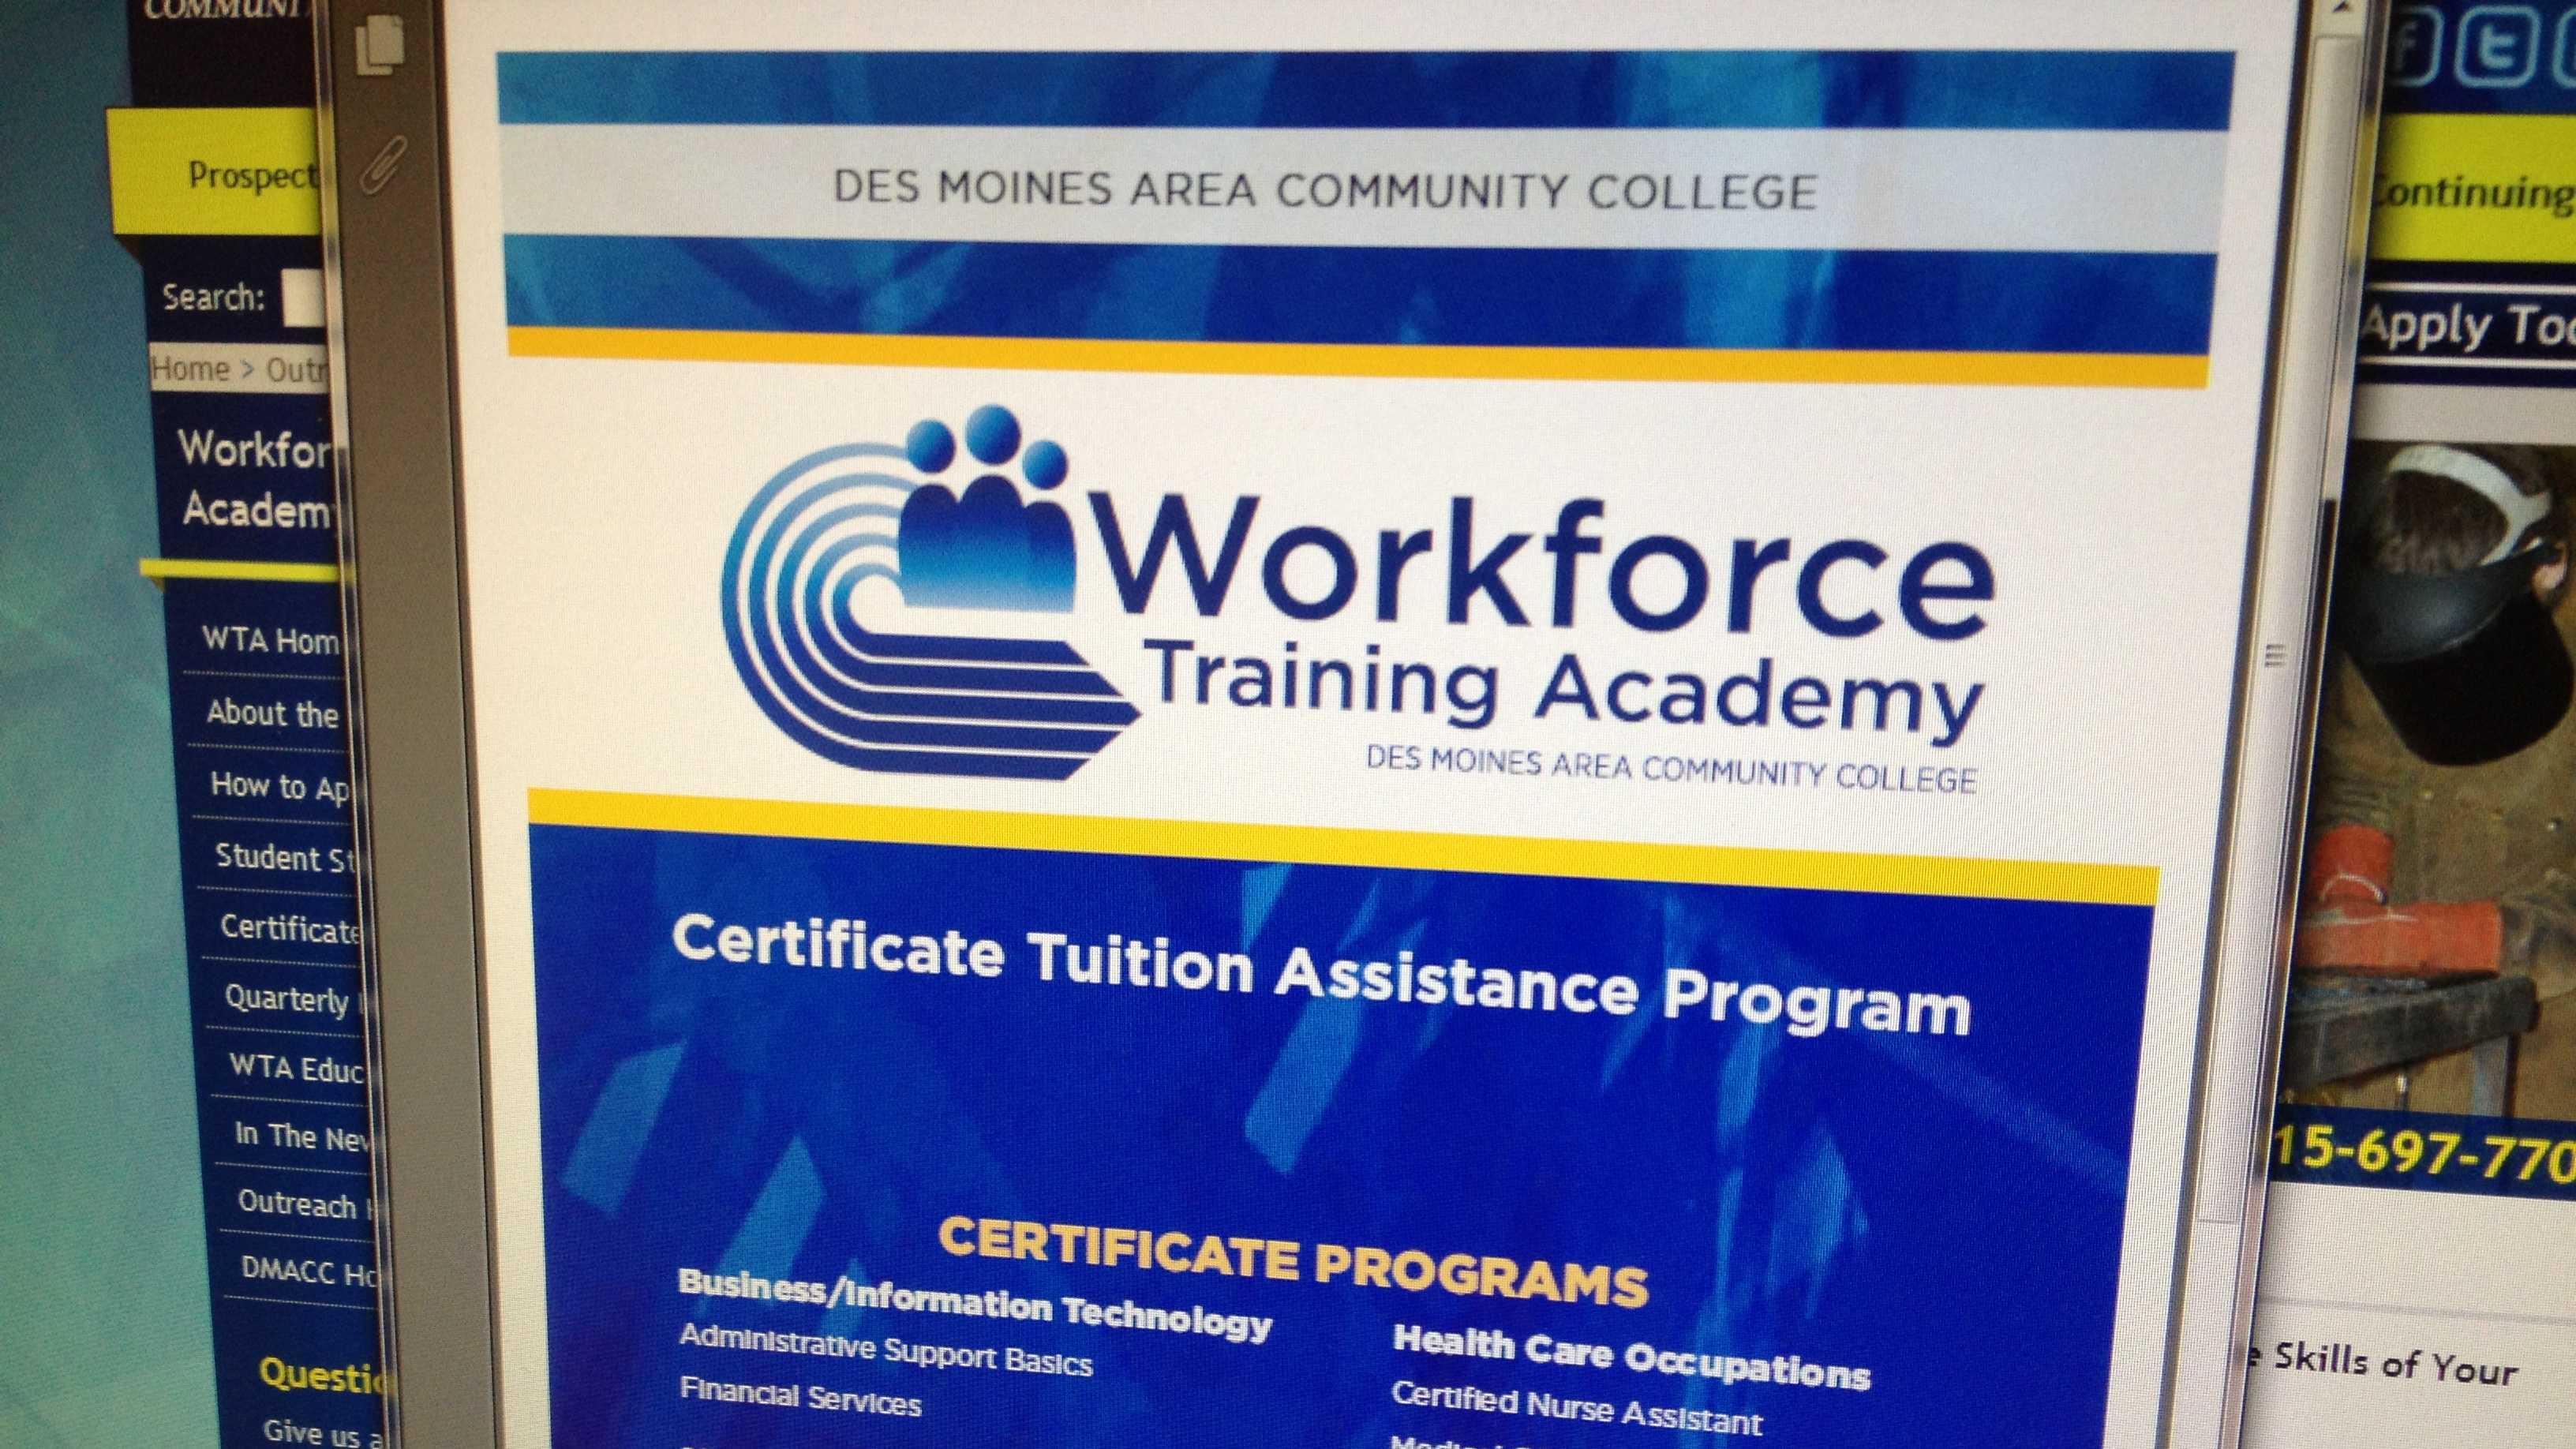 DMACC Academy flier